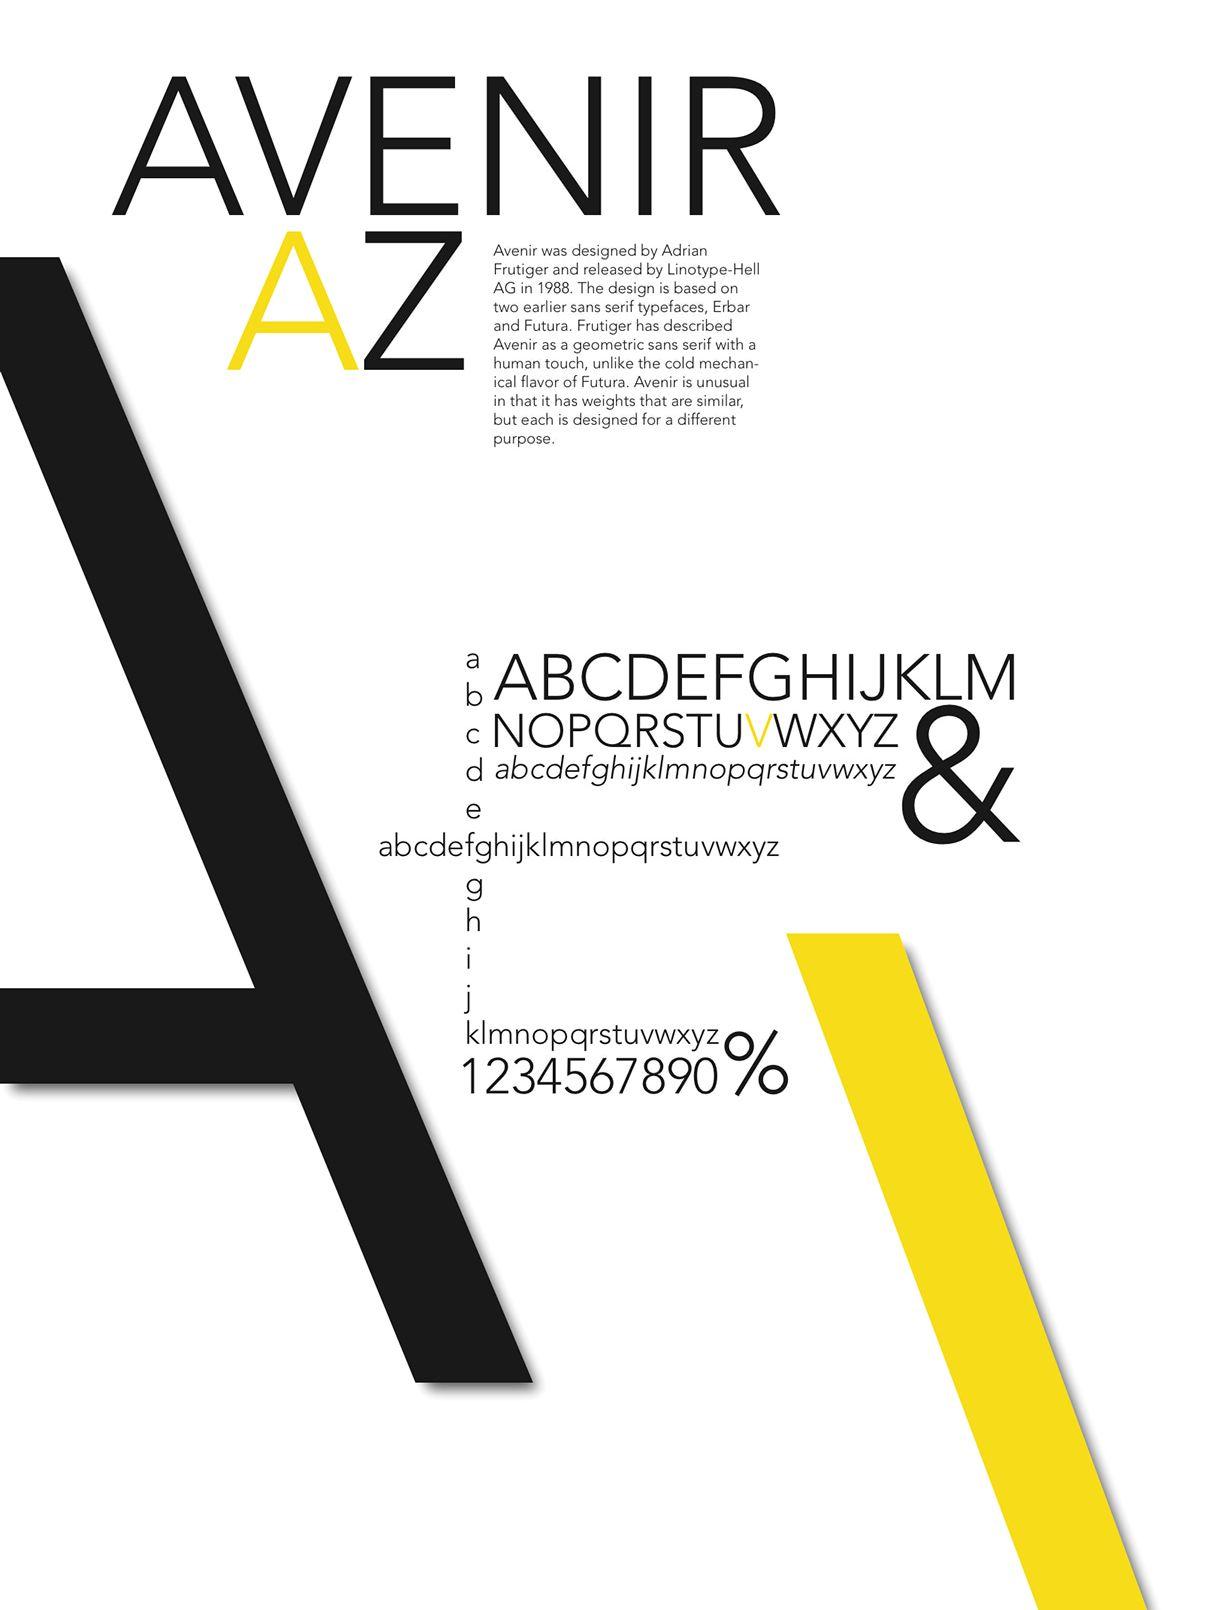 Avenir Sans-serif Grotesque 1988 Adrian Frutiger Poster by Brett Jacobsen